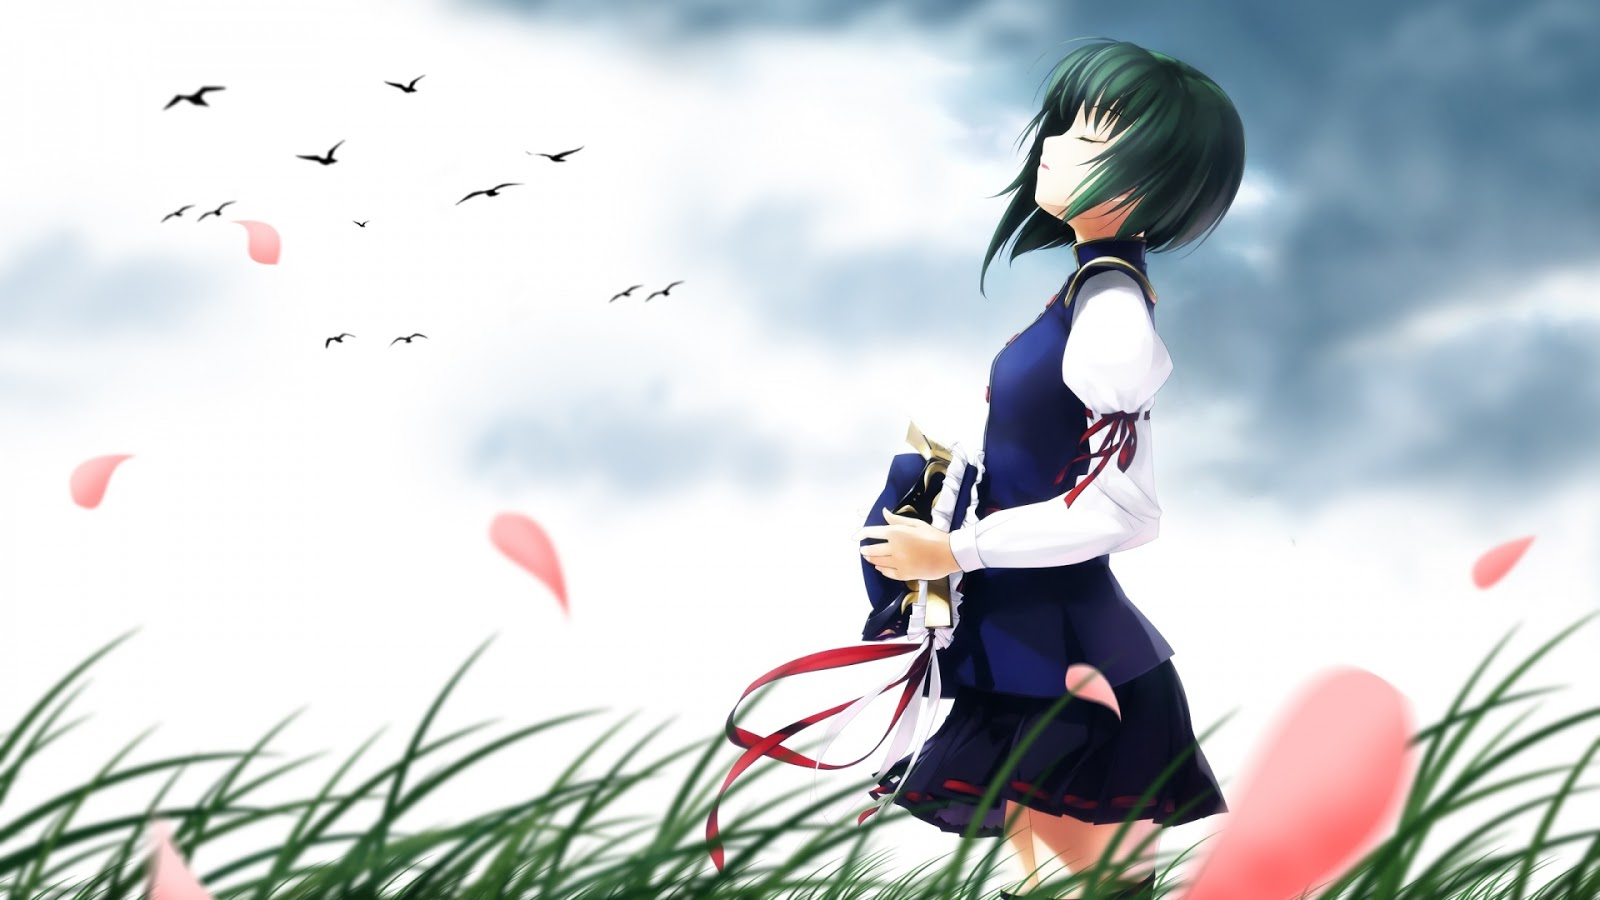 Anime Serenity